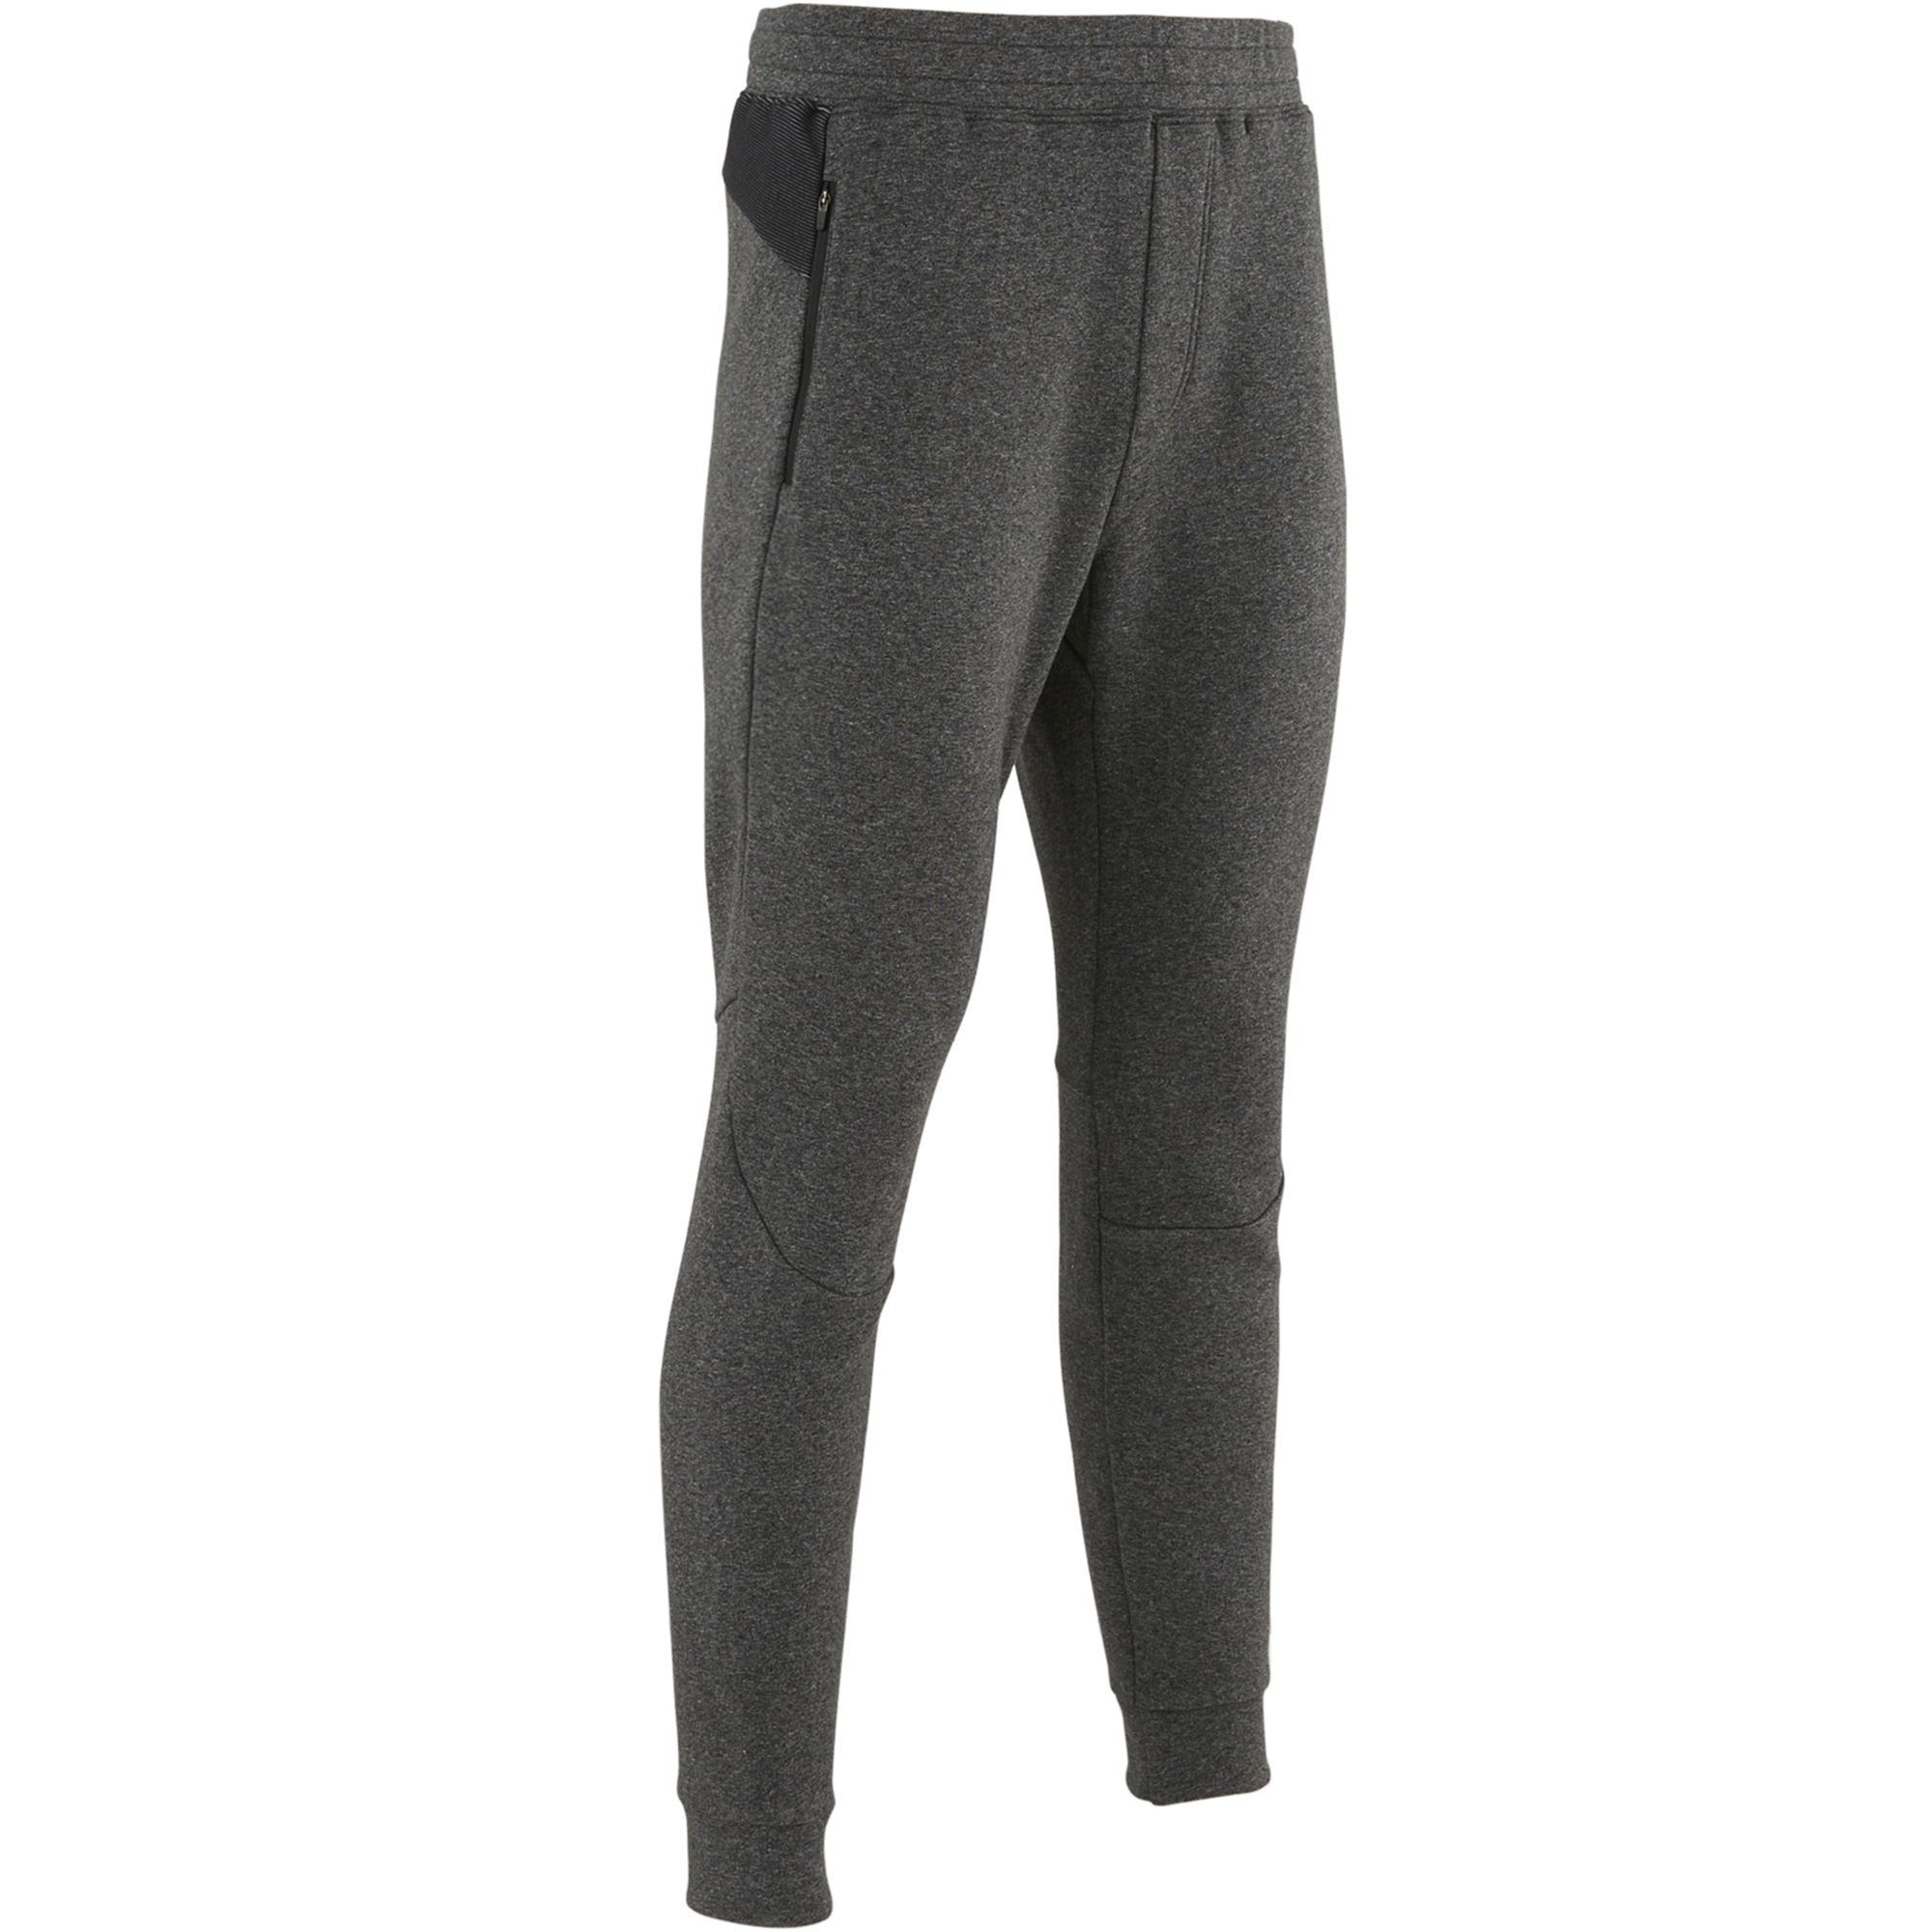 Pantaloni uomo gym pilates 580 grigio scuro  c8d55f77fd70